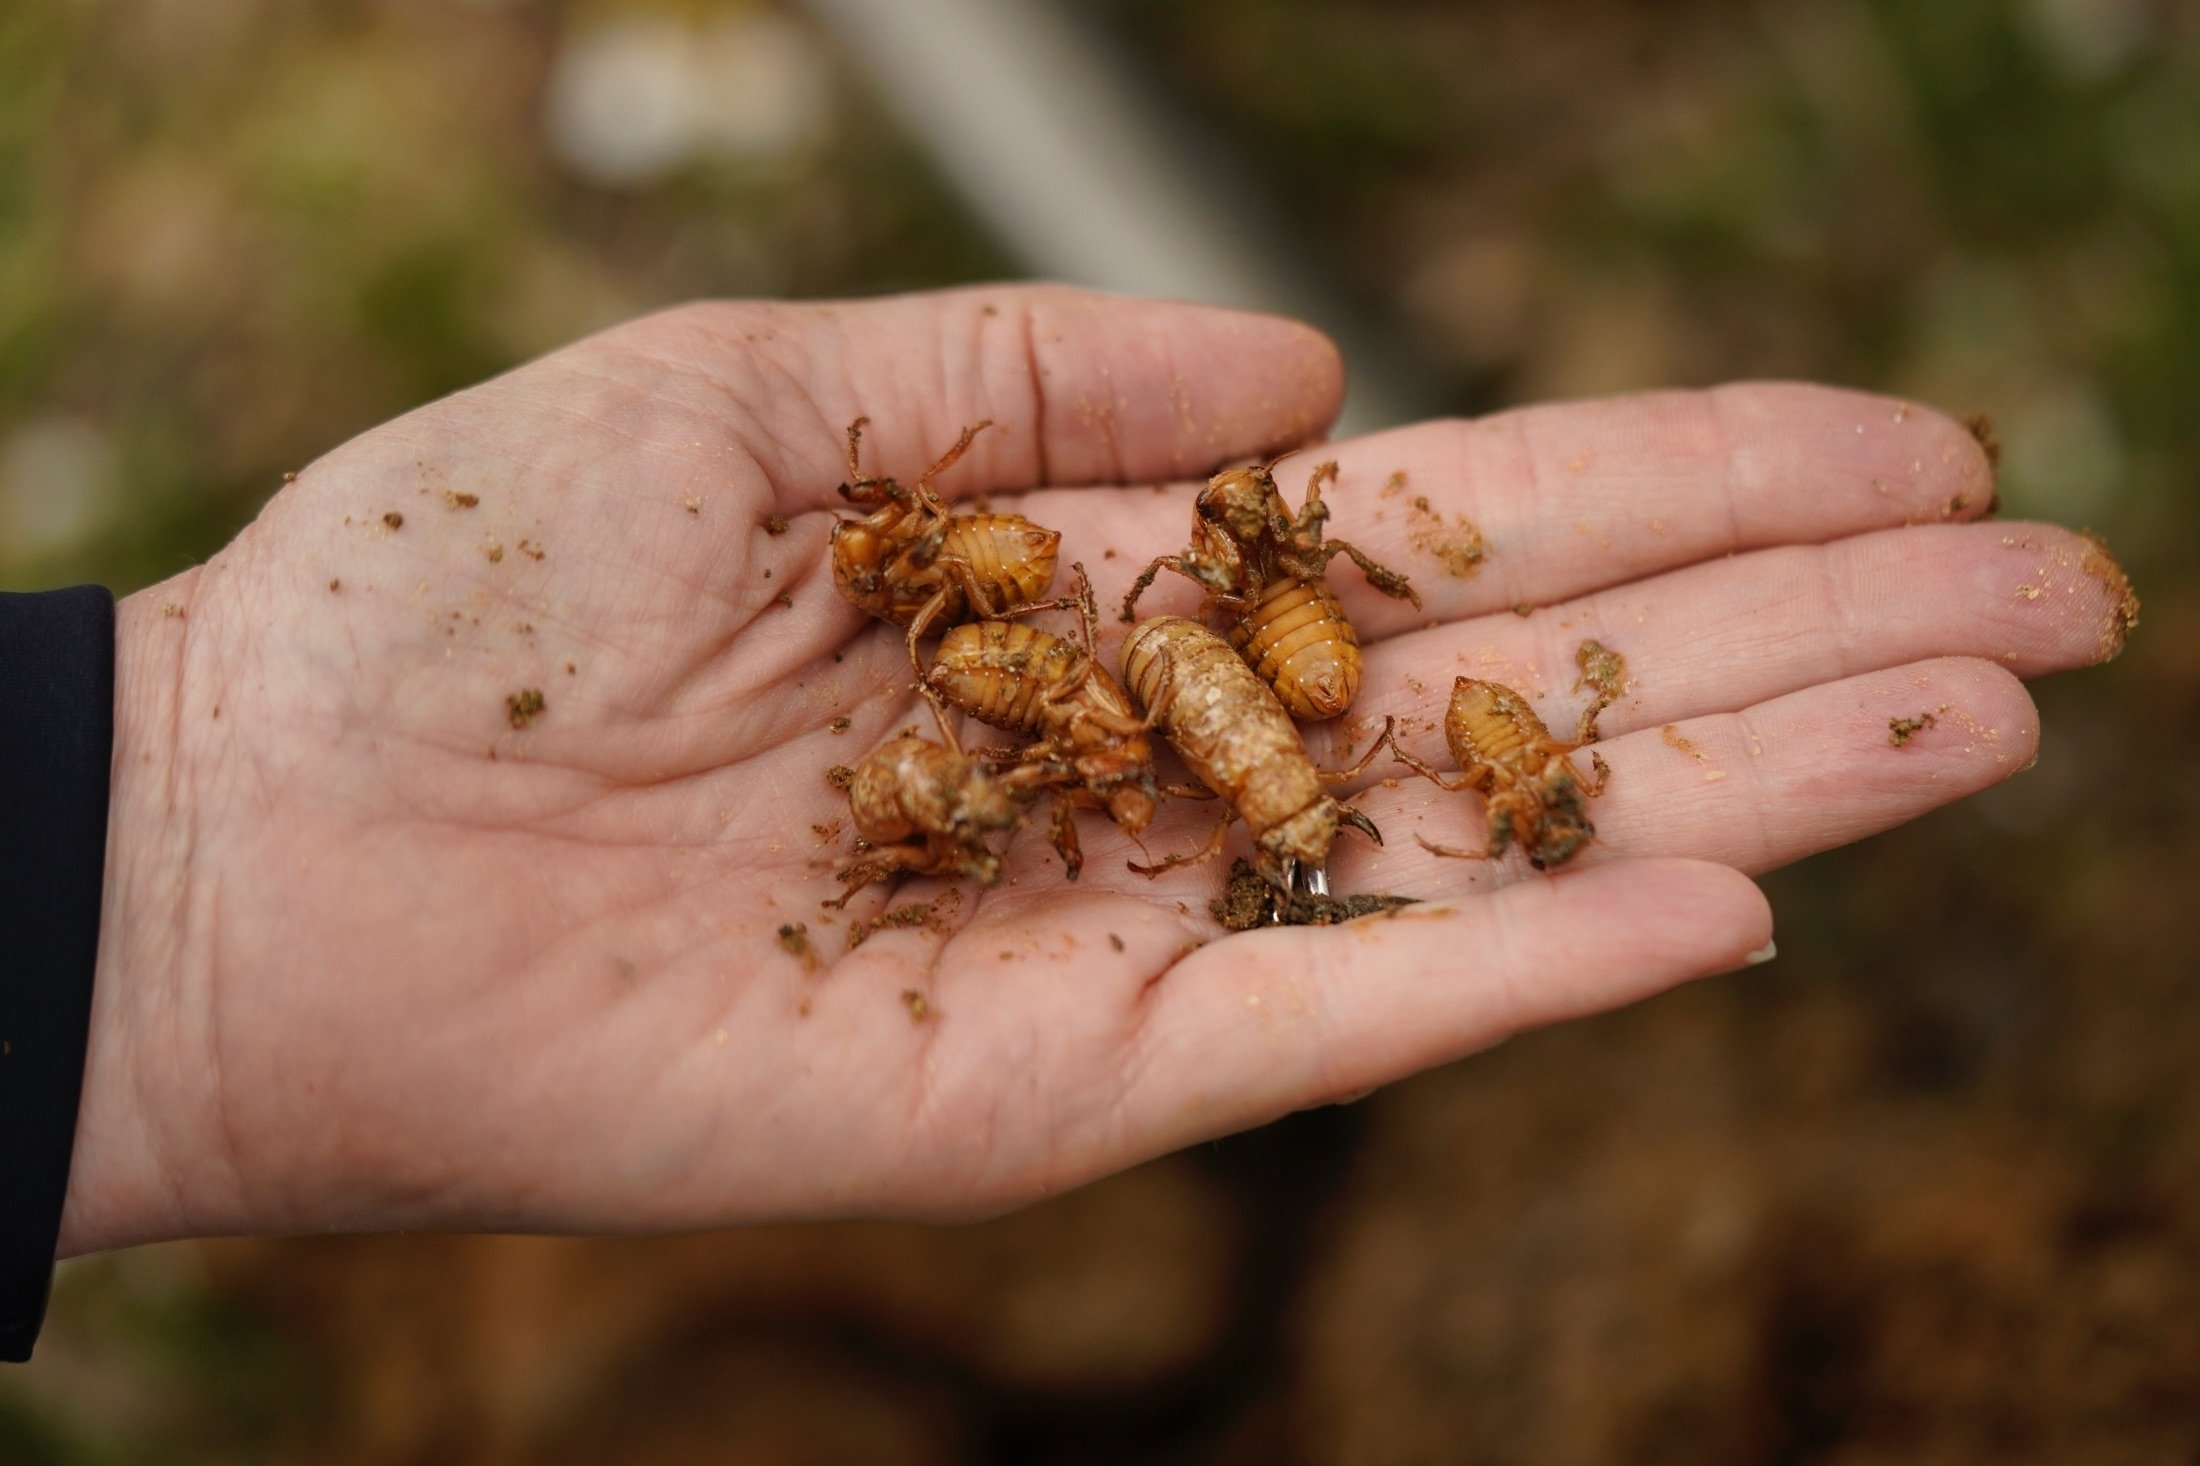 University of Maryland entomologist Paula Shrewsbury displays a handful of cicada nymphs found in a shovel of dirt in a suburban backyard in Columbia, Maryland, U.S., April 13, 2021. (AP Photo)